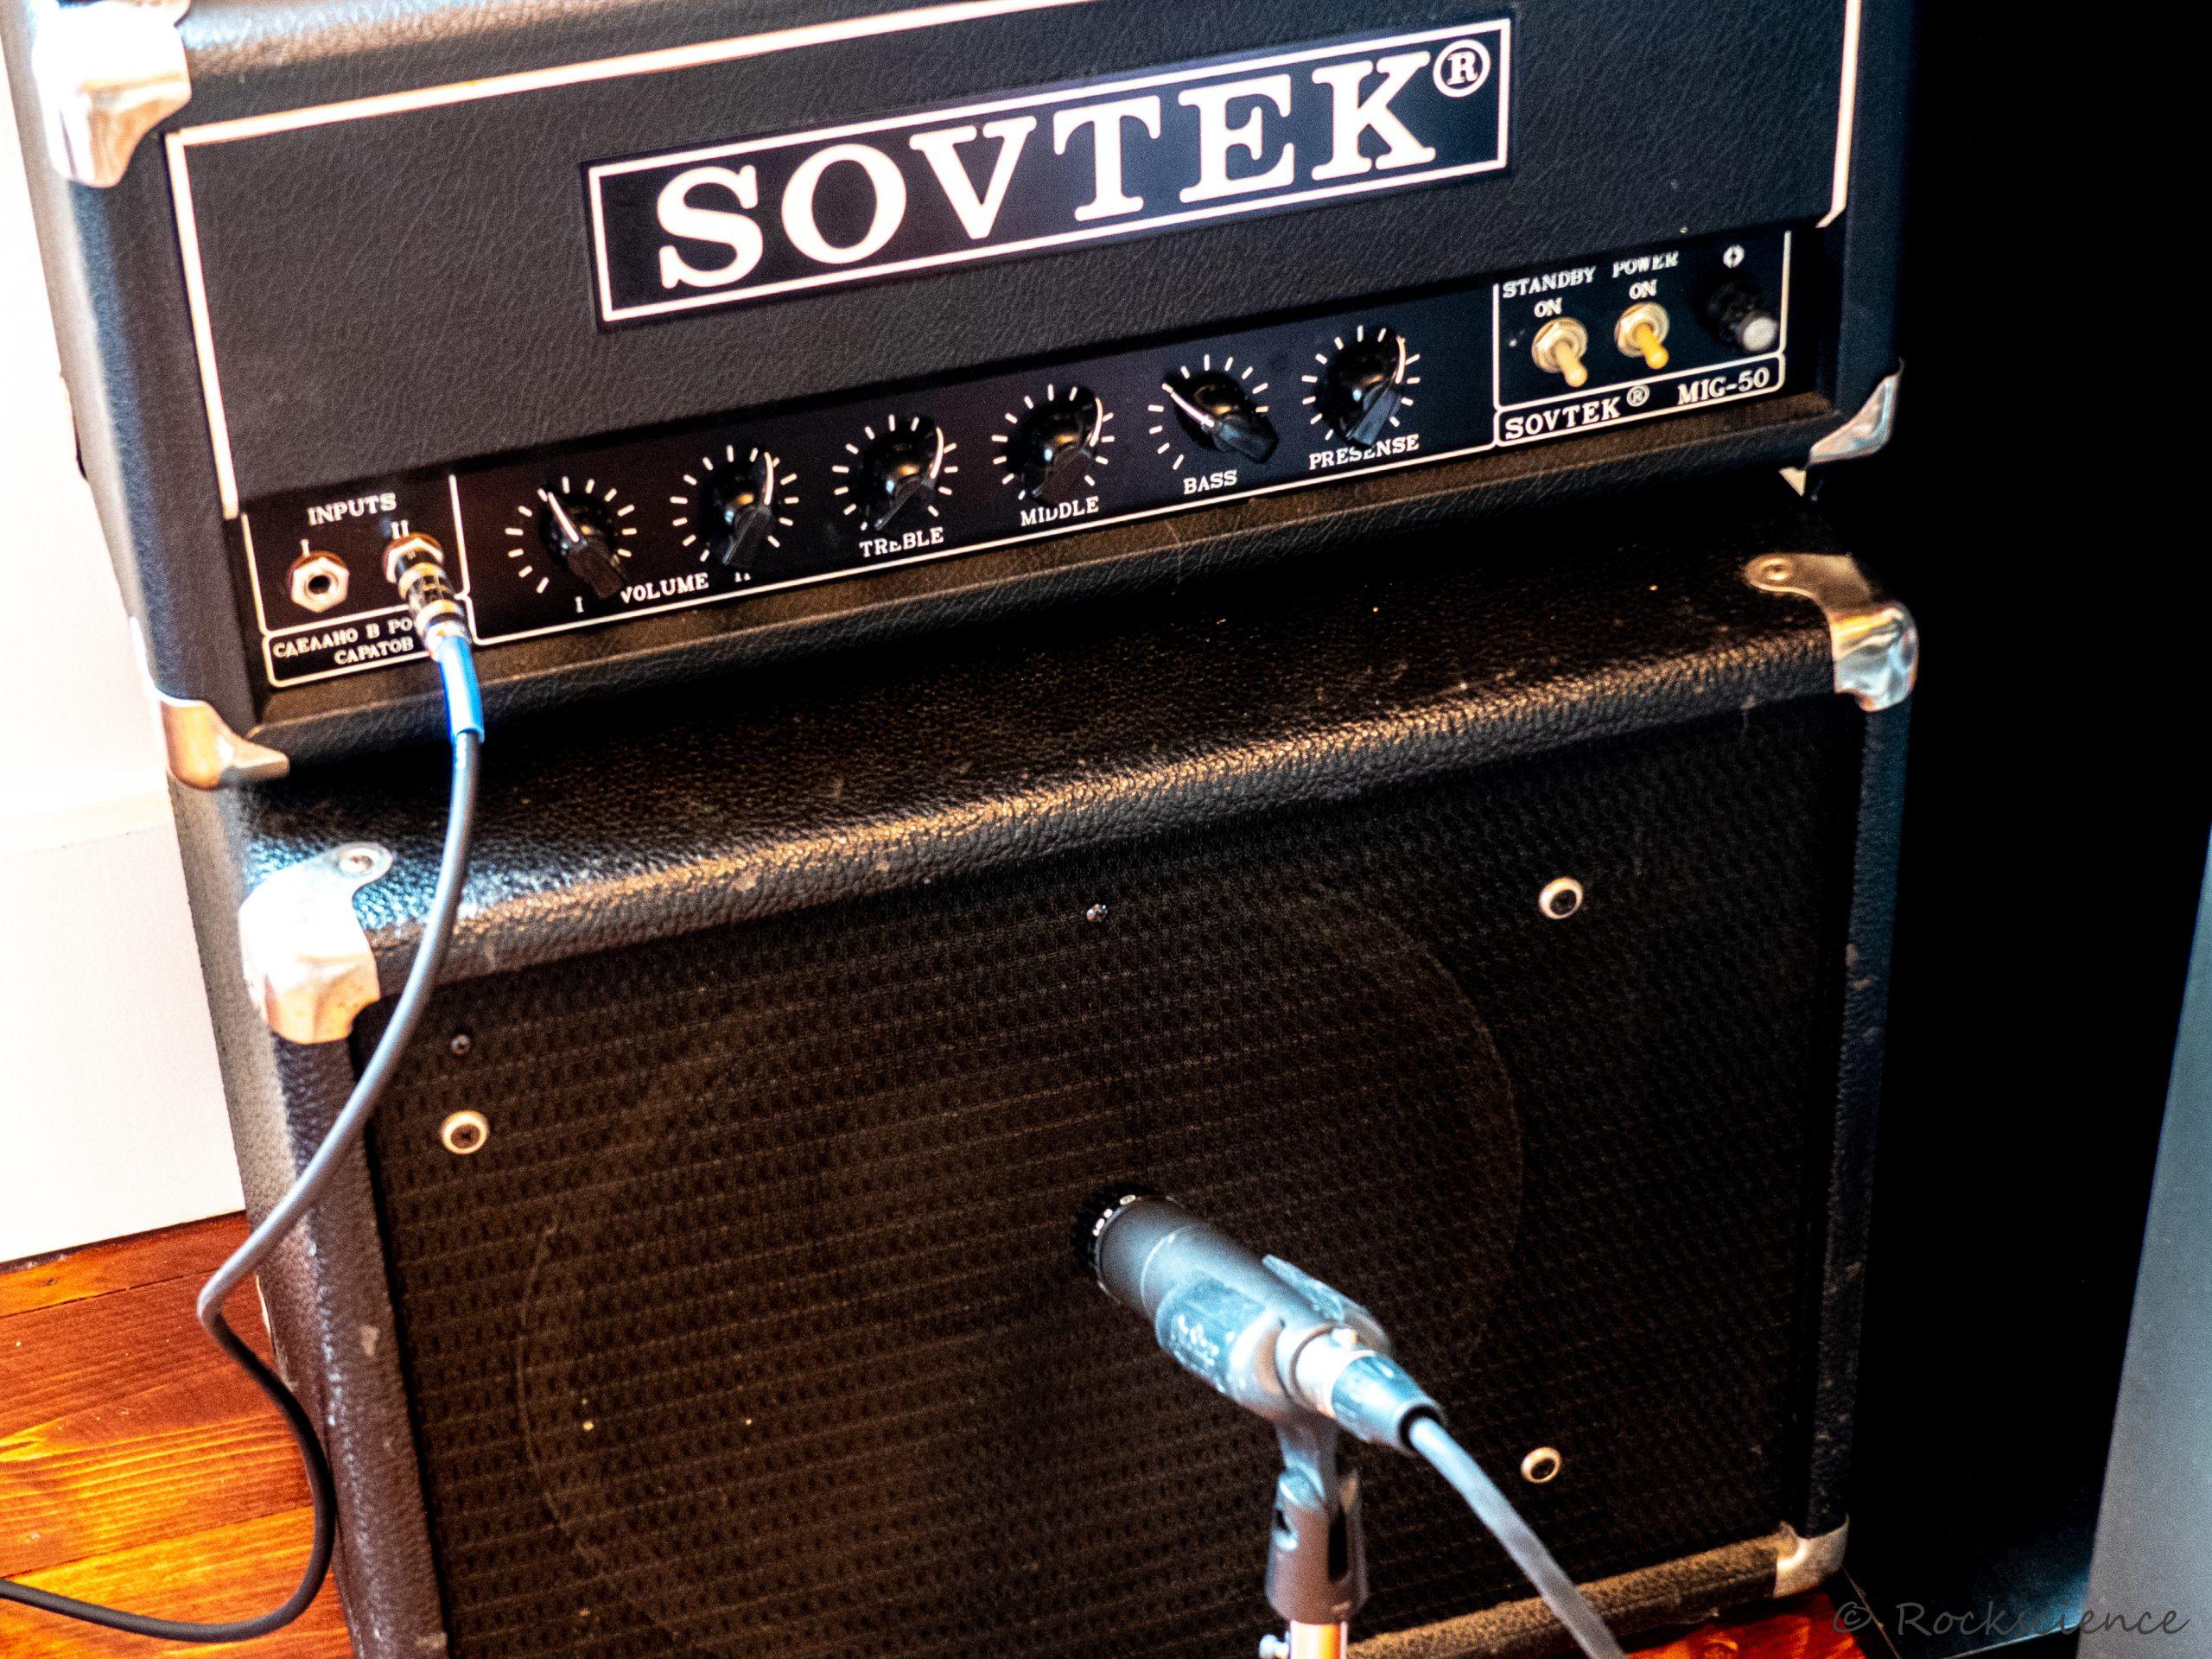 fine russian amplifier no. 1. sovtek mig-50 head and mesa-boogie cab